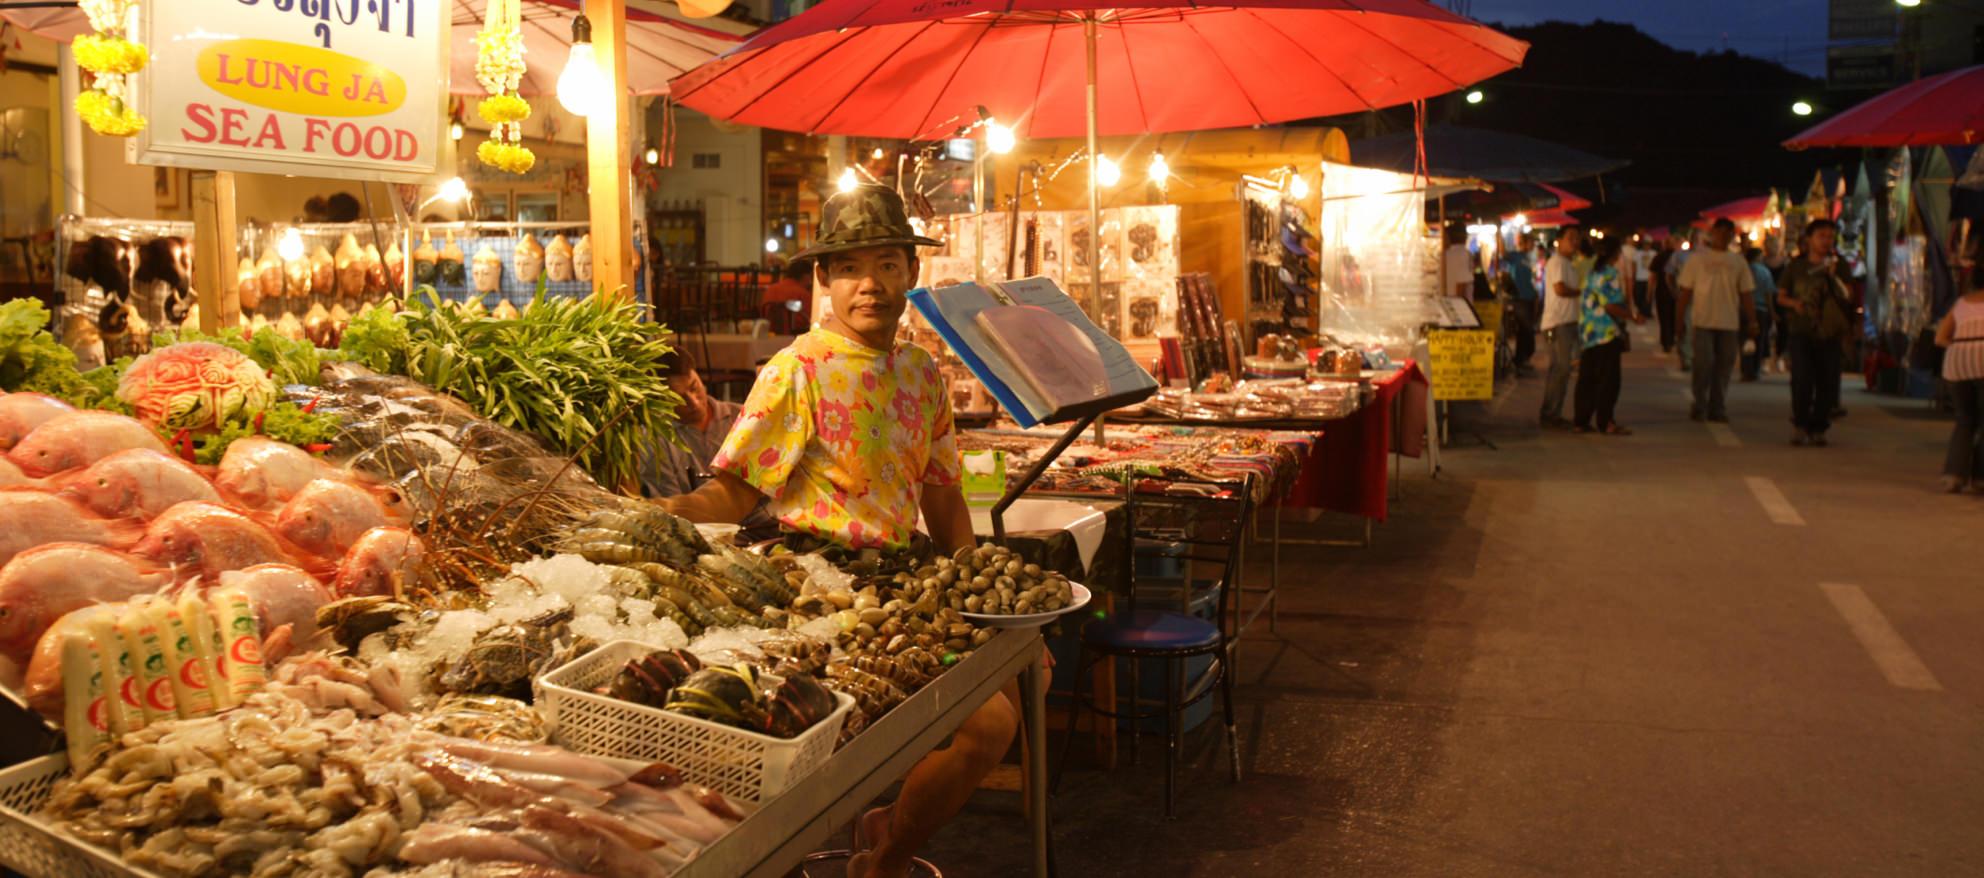 explore-night-market-2